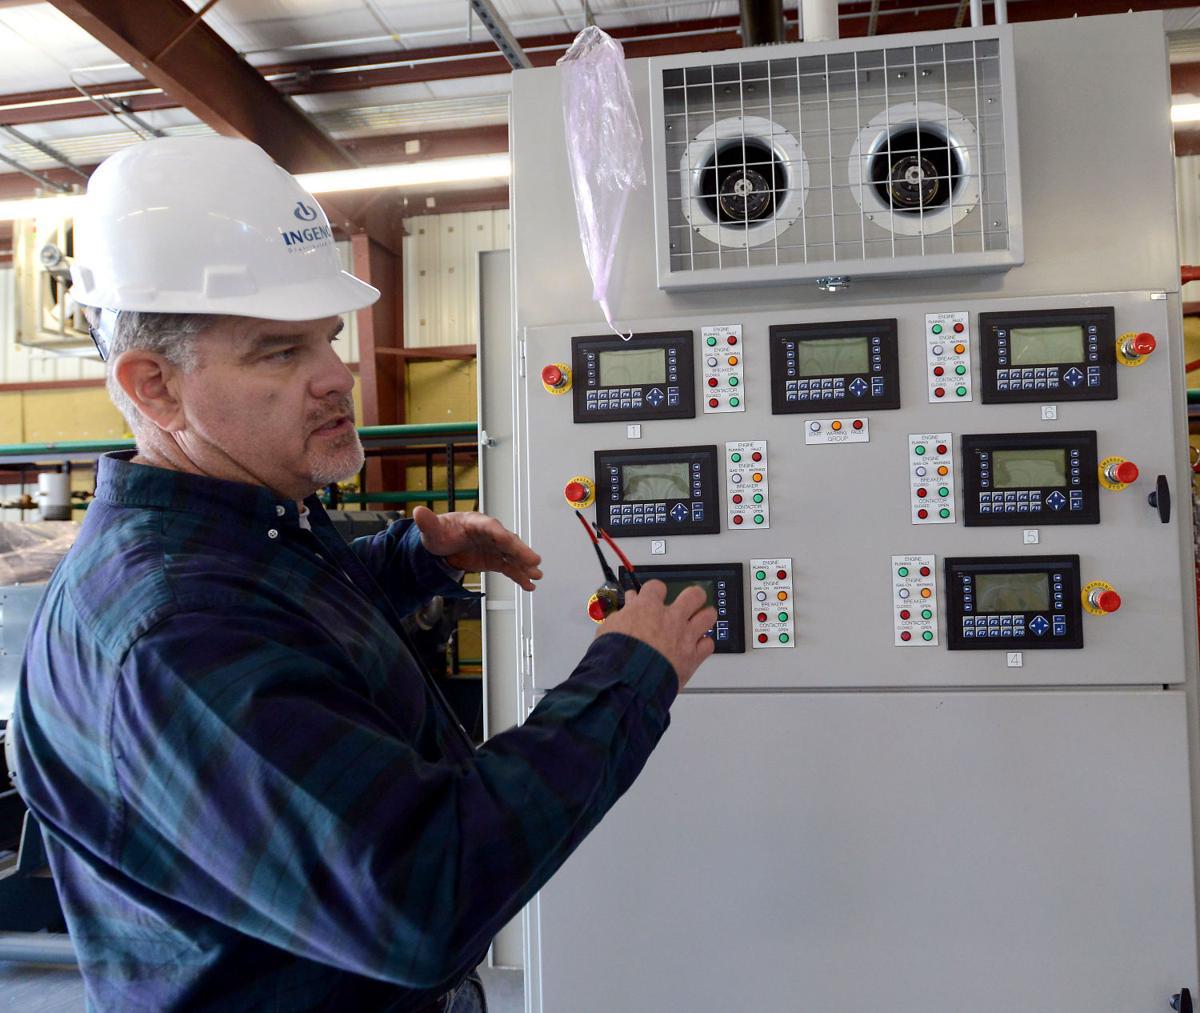 Company Will Convert Bristol Virginia Landfills Methane Gas Into Panel Wiring Jobs Electricity